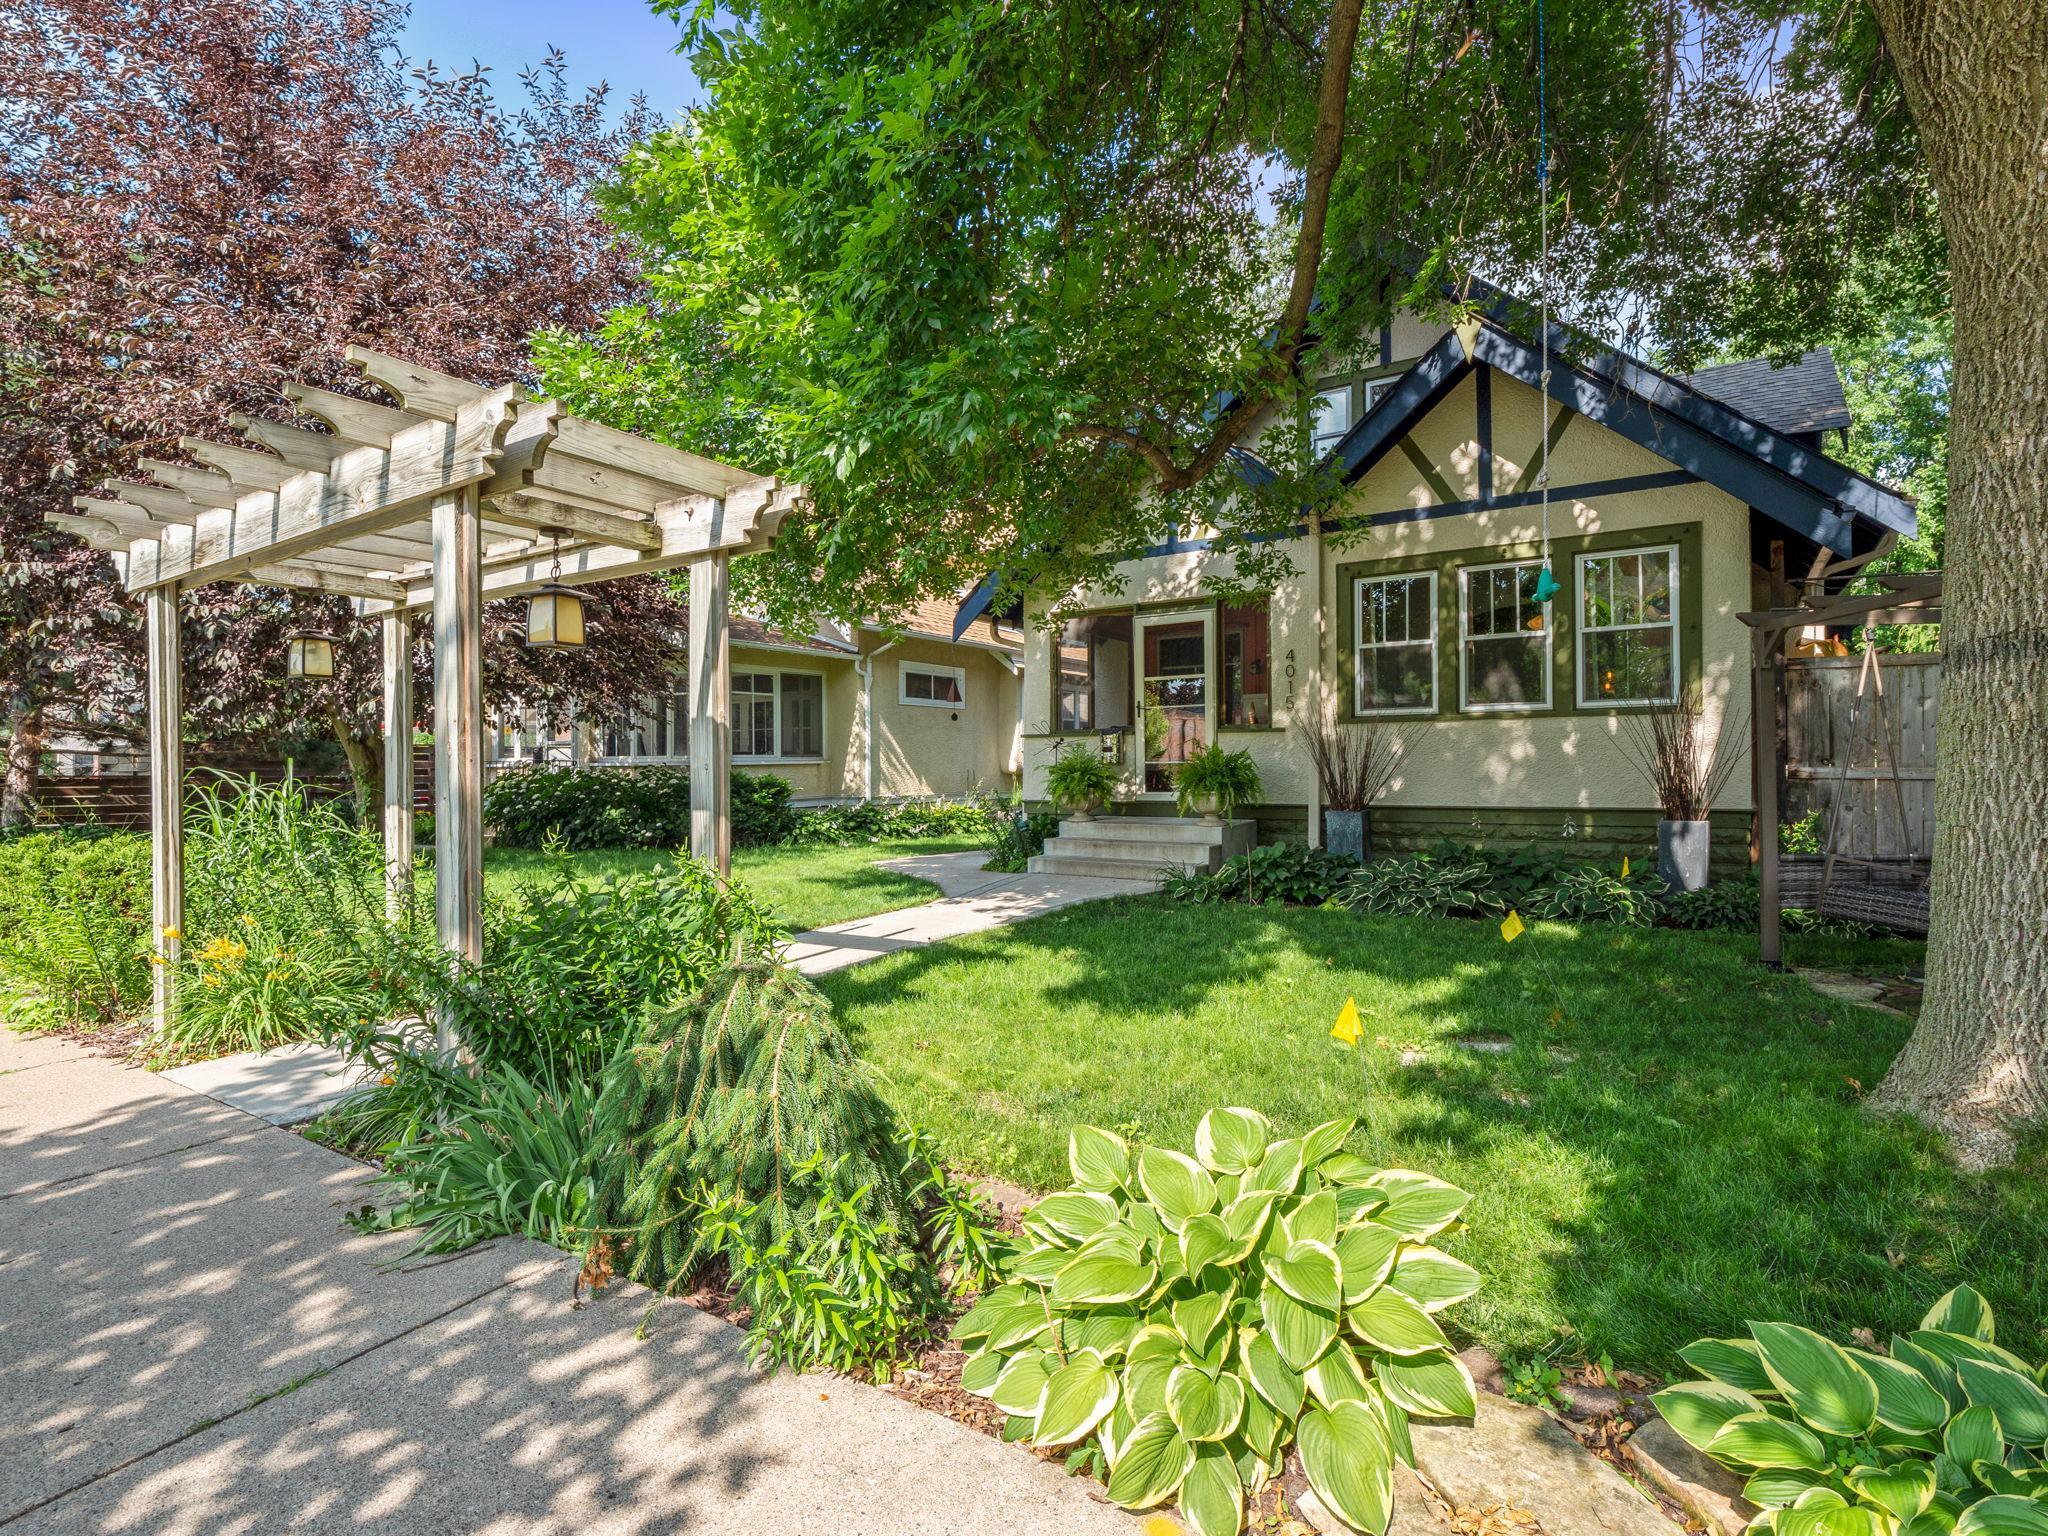 4015 Lyndale S Property Photo - Minneapolis, MN real estate listing